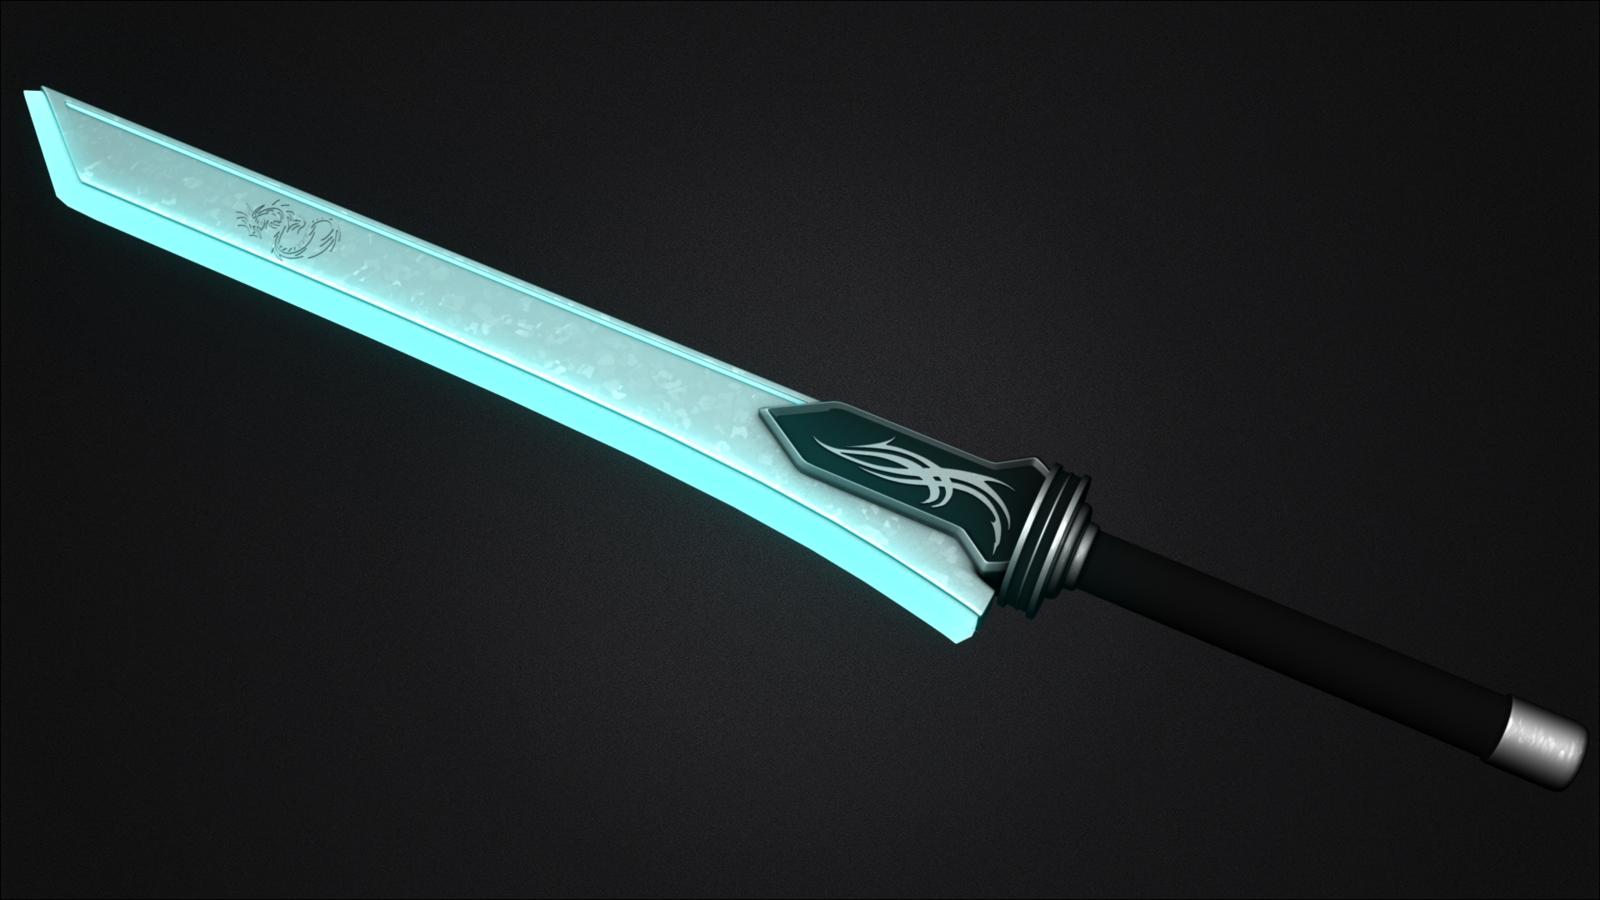 Futuristic Sword By Mbp1225 On Deviantart Fantasy Sword Weapon Concept Art Sword